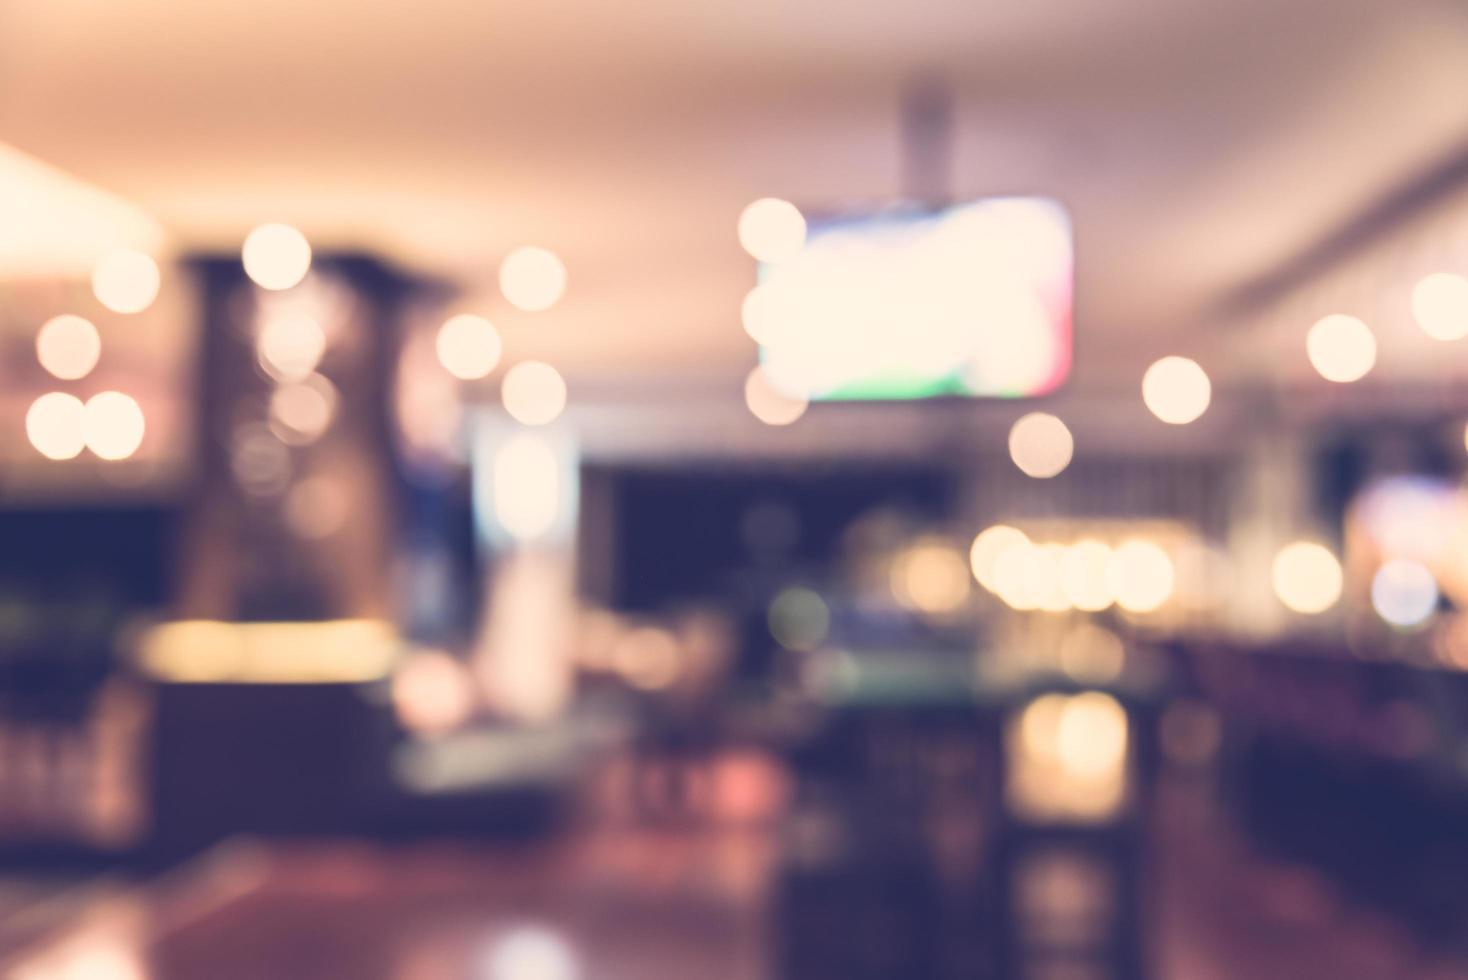 Abstract blur restaurant background - vintage filter photo